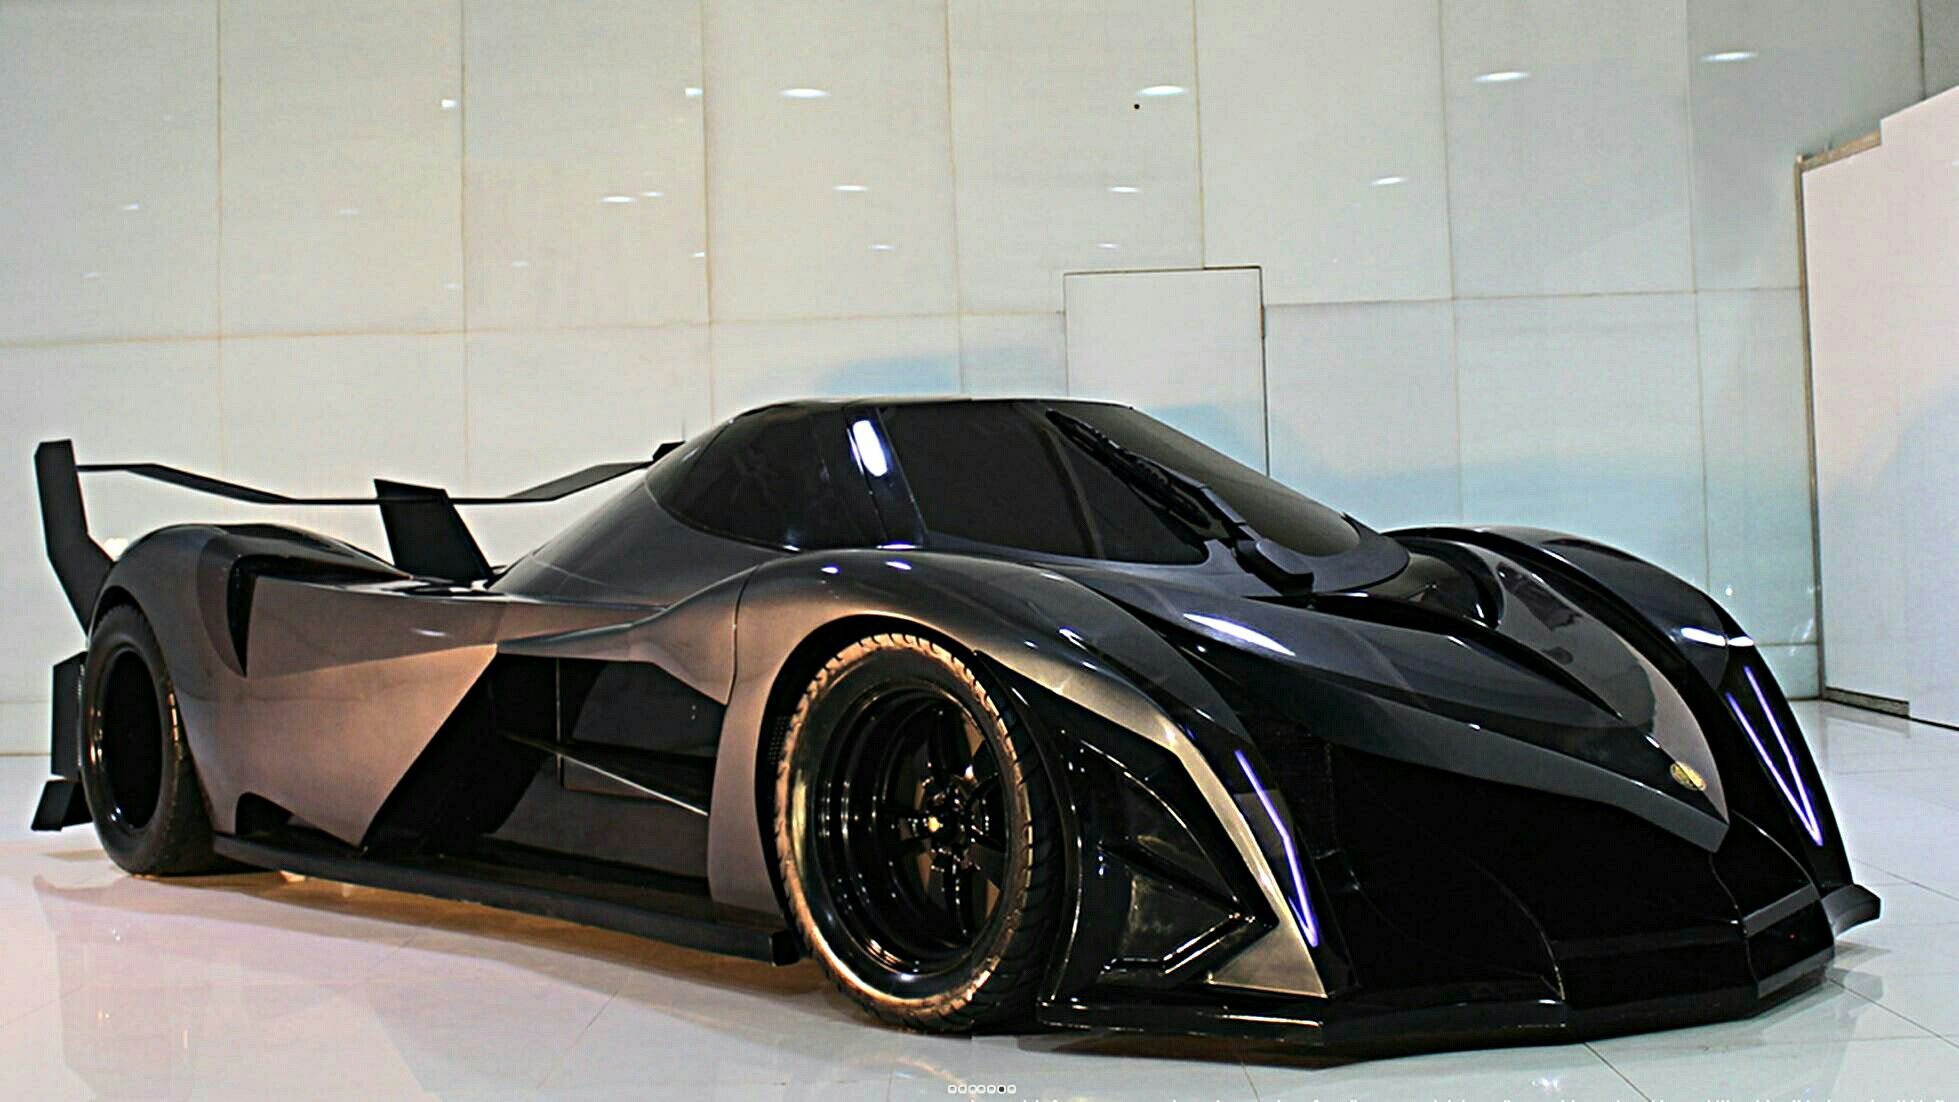 Devel 16 Hypercar Super Cars Top 10 Fastest Cars Cars